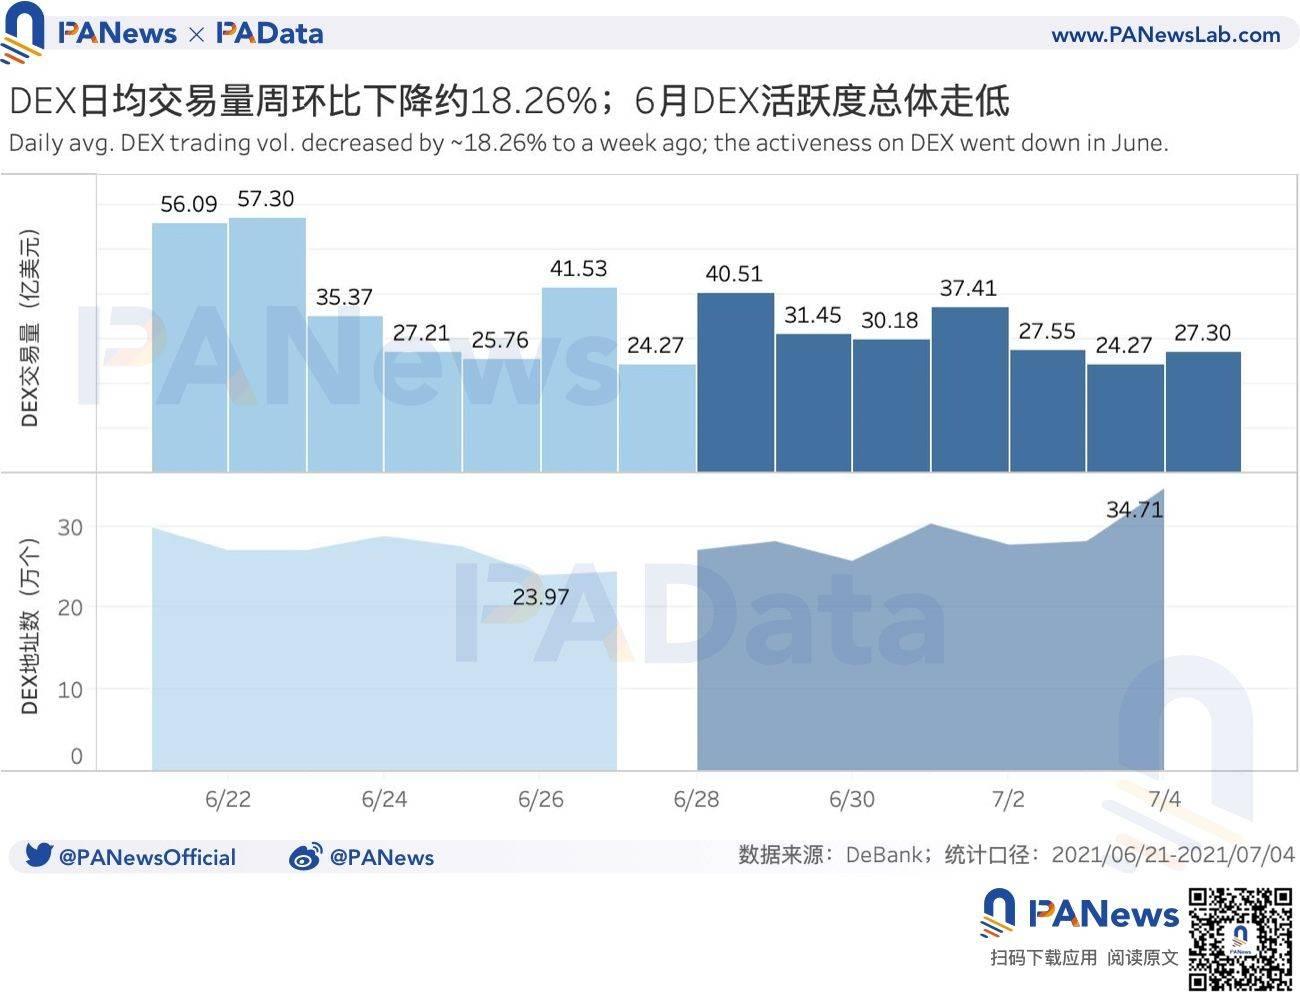 DeFi一周回顾:DEX日均交易量持续下跌,清算量周环比直降超96%